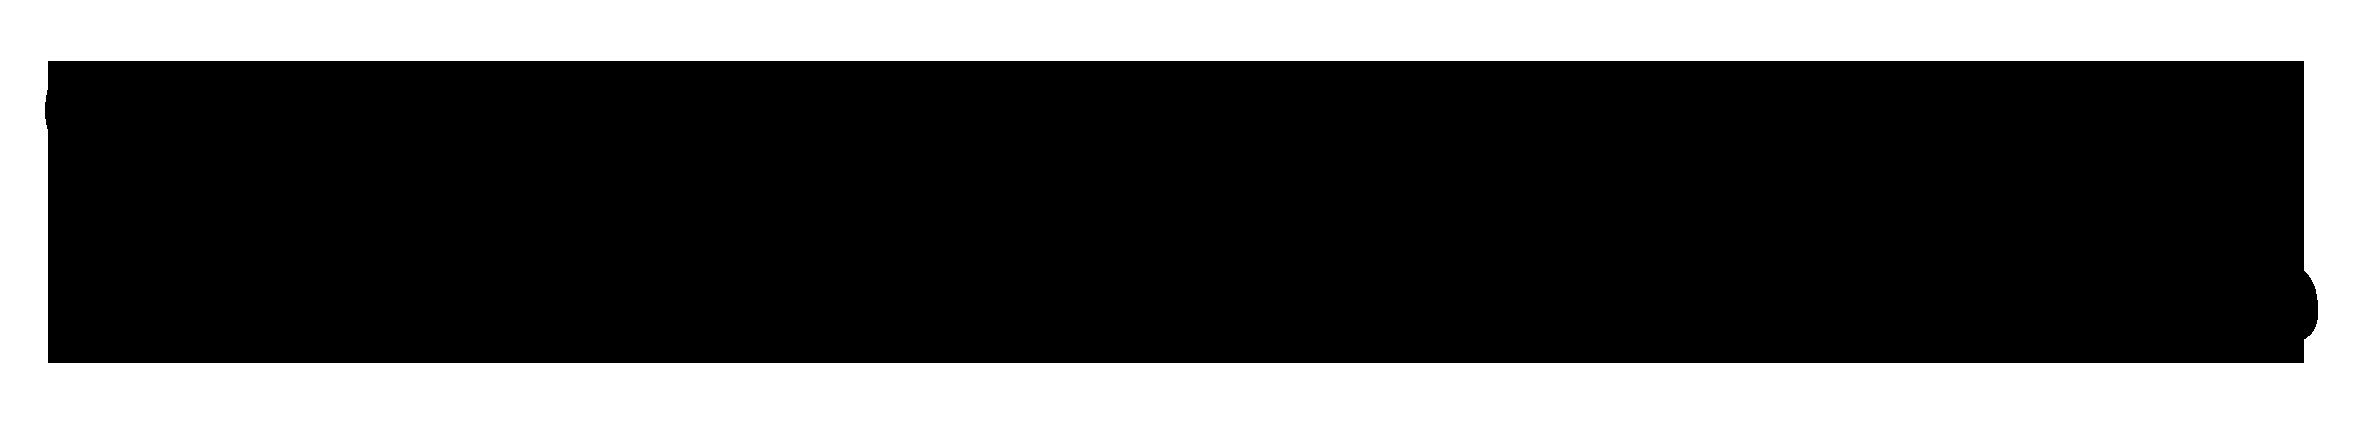 Plasmir